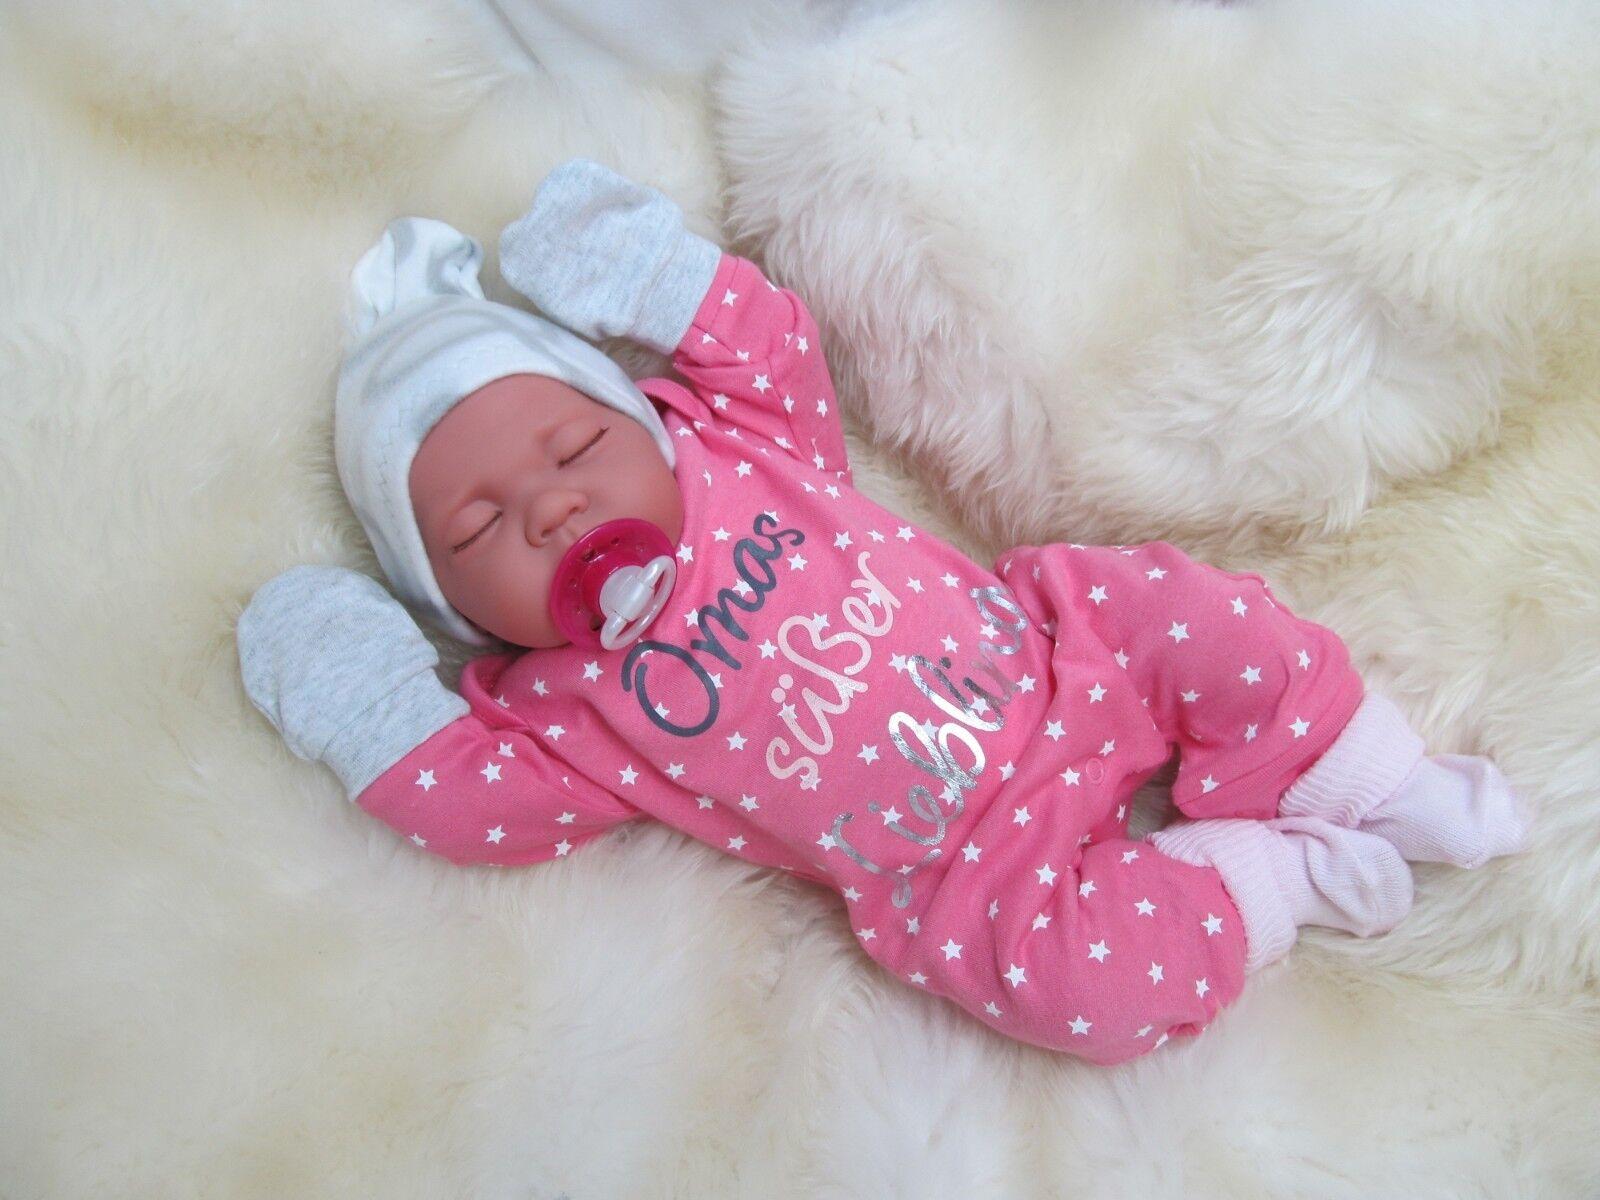 Ninisingen Reborn BABY RealLife Nina REBORN BAMBOLA BABY BAMBOLA rebornbaby circa 45 cm